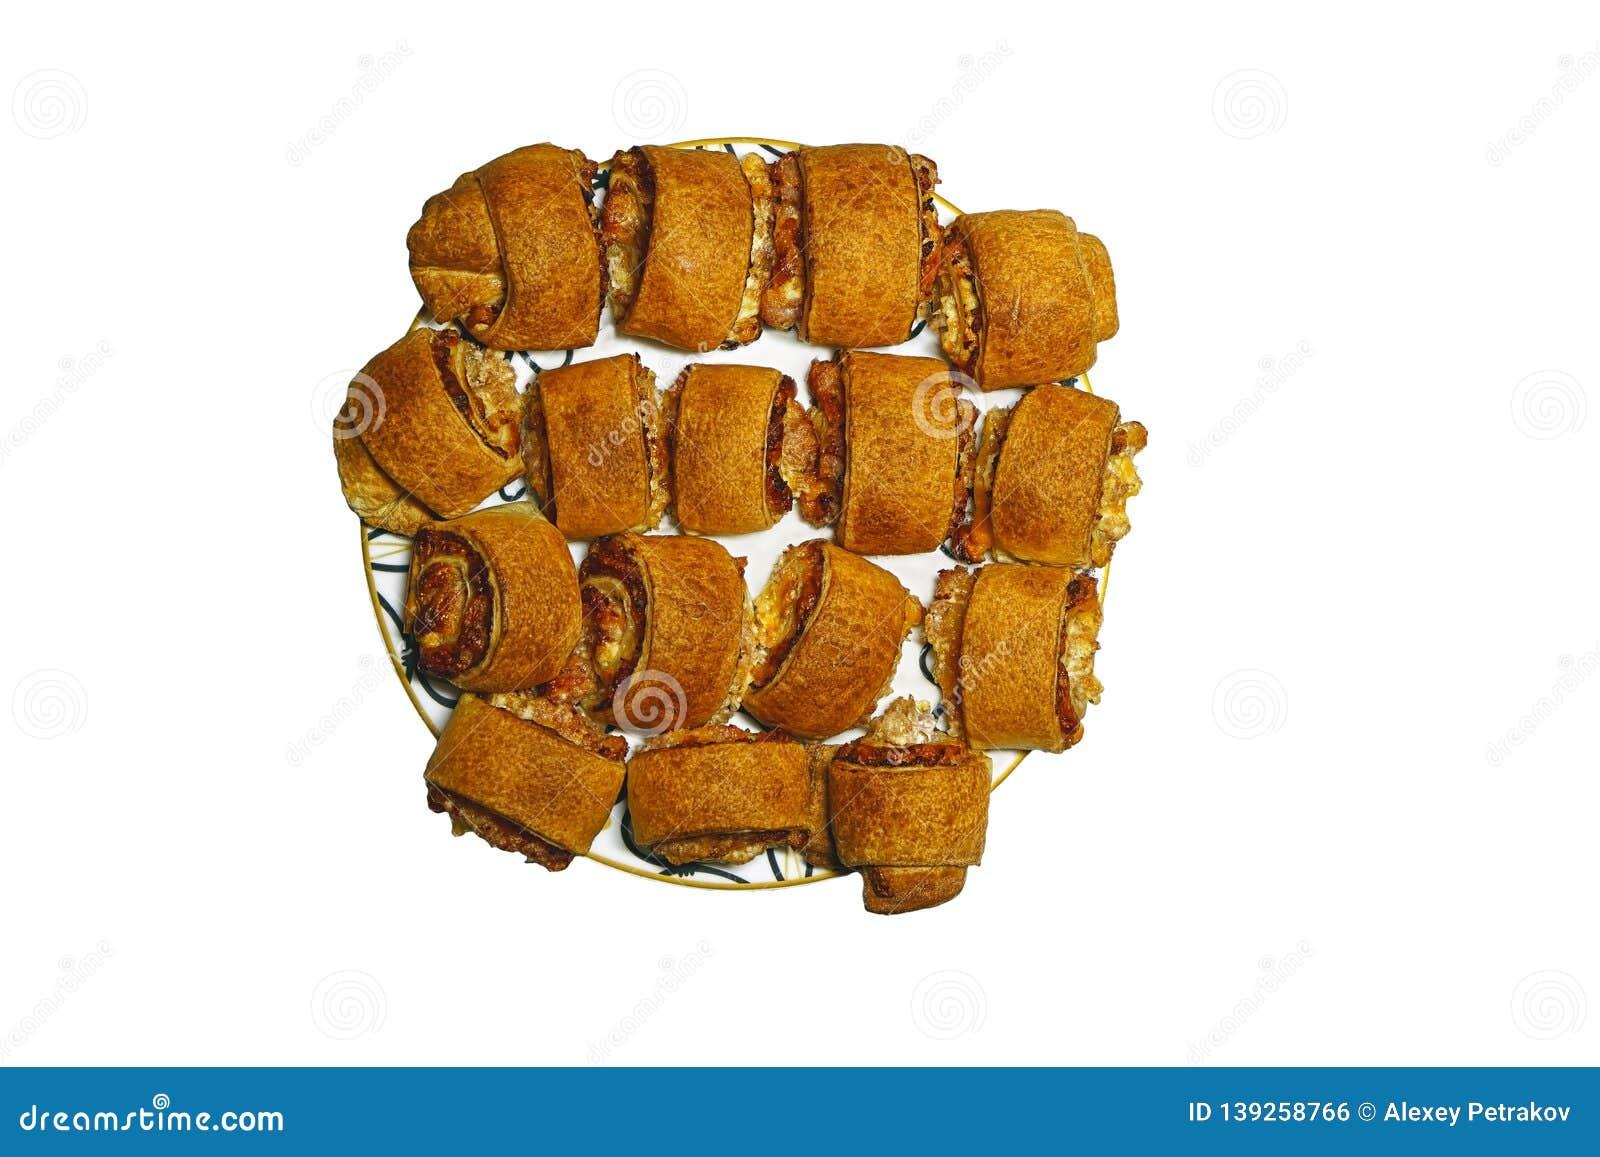 Five baked meat rolls on a platter